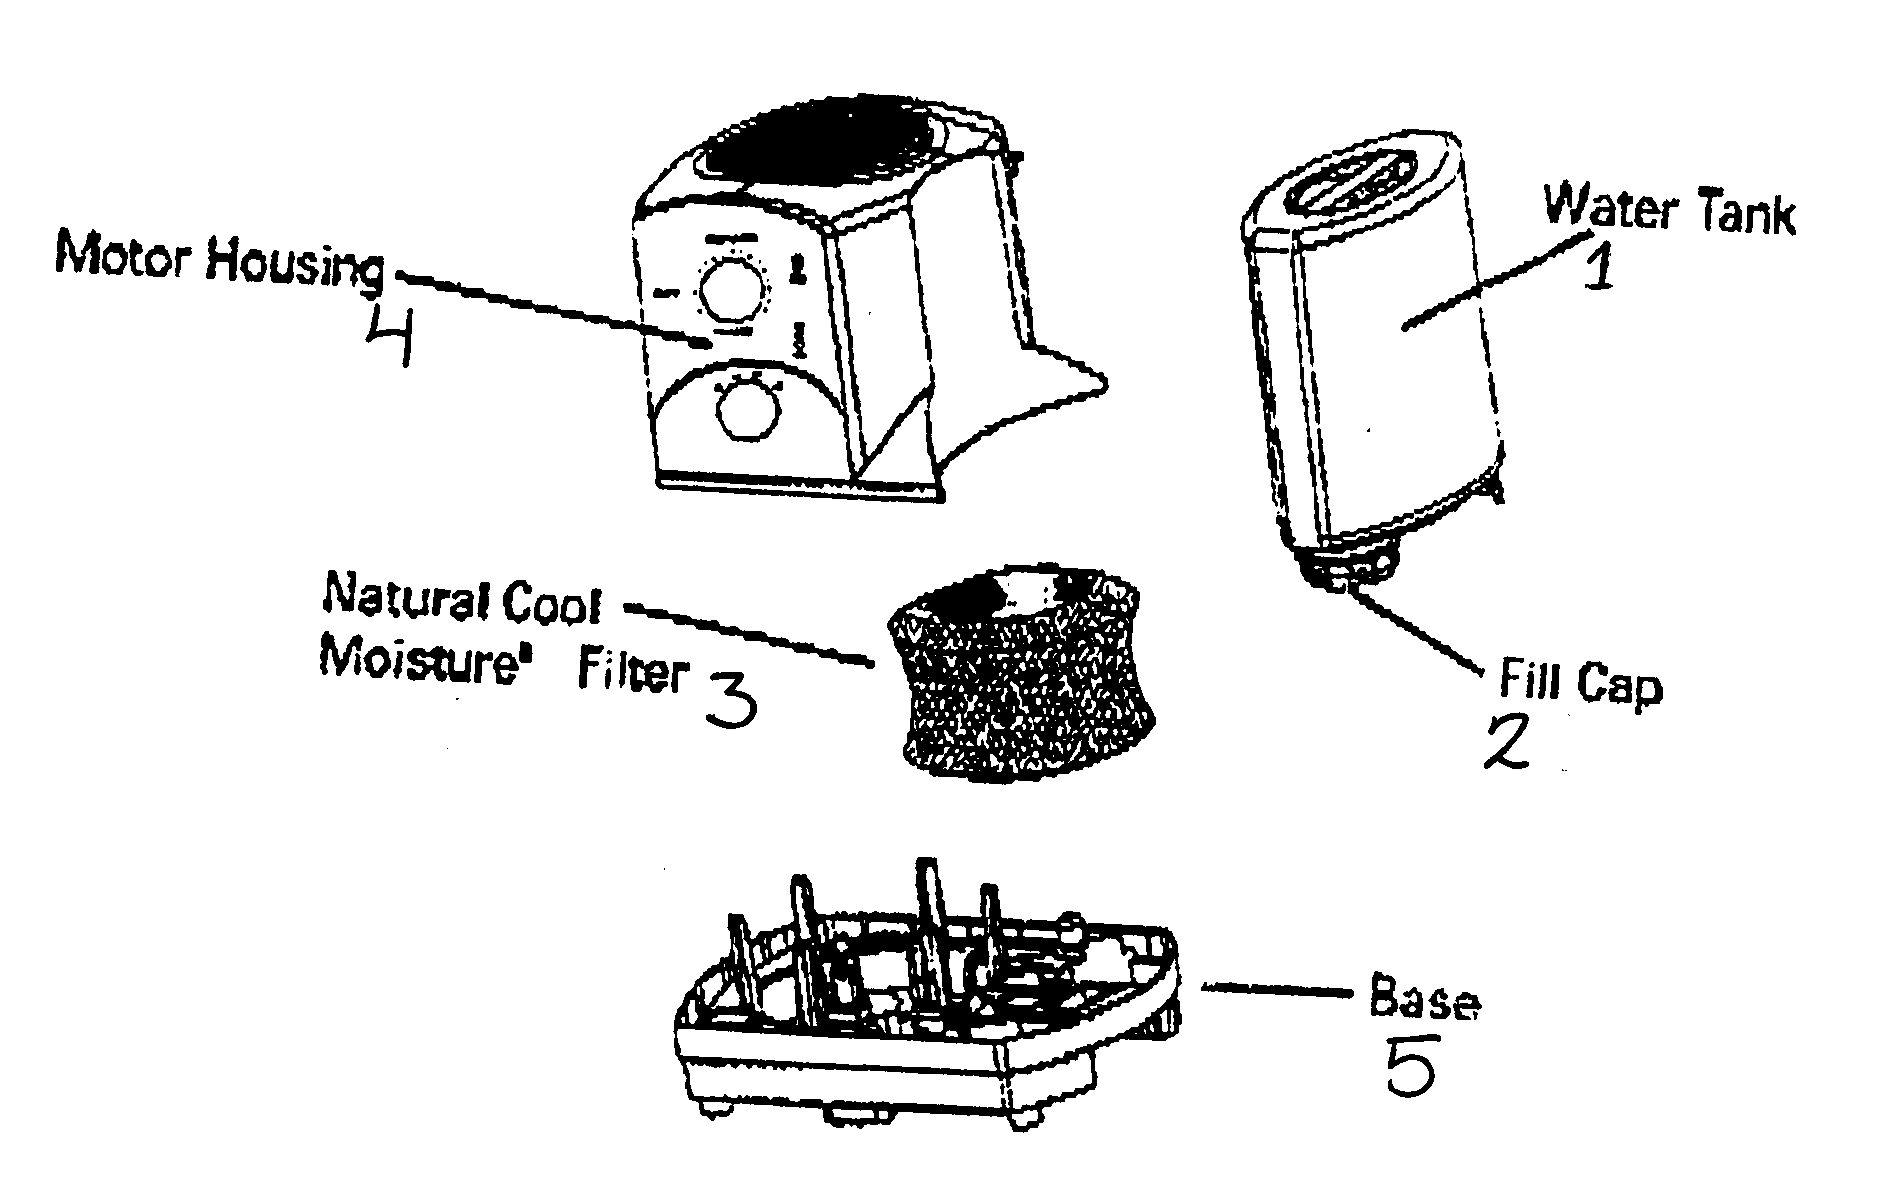 Honeywell model HCM-1010 humidifier genuine parts